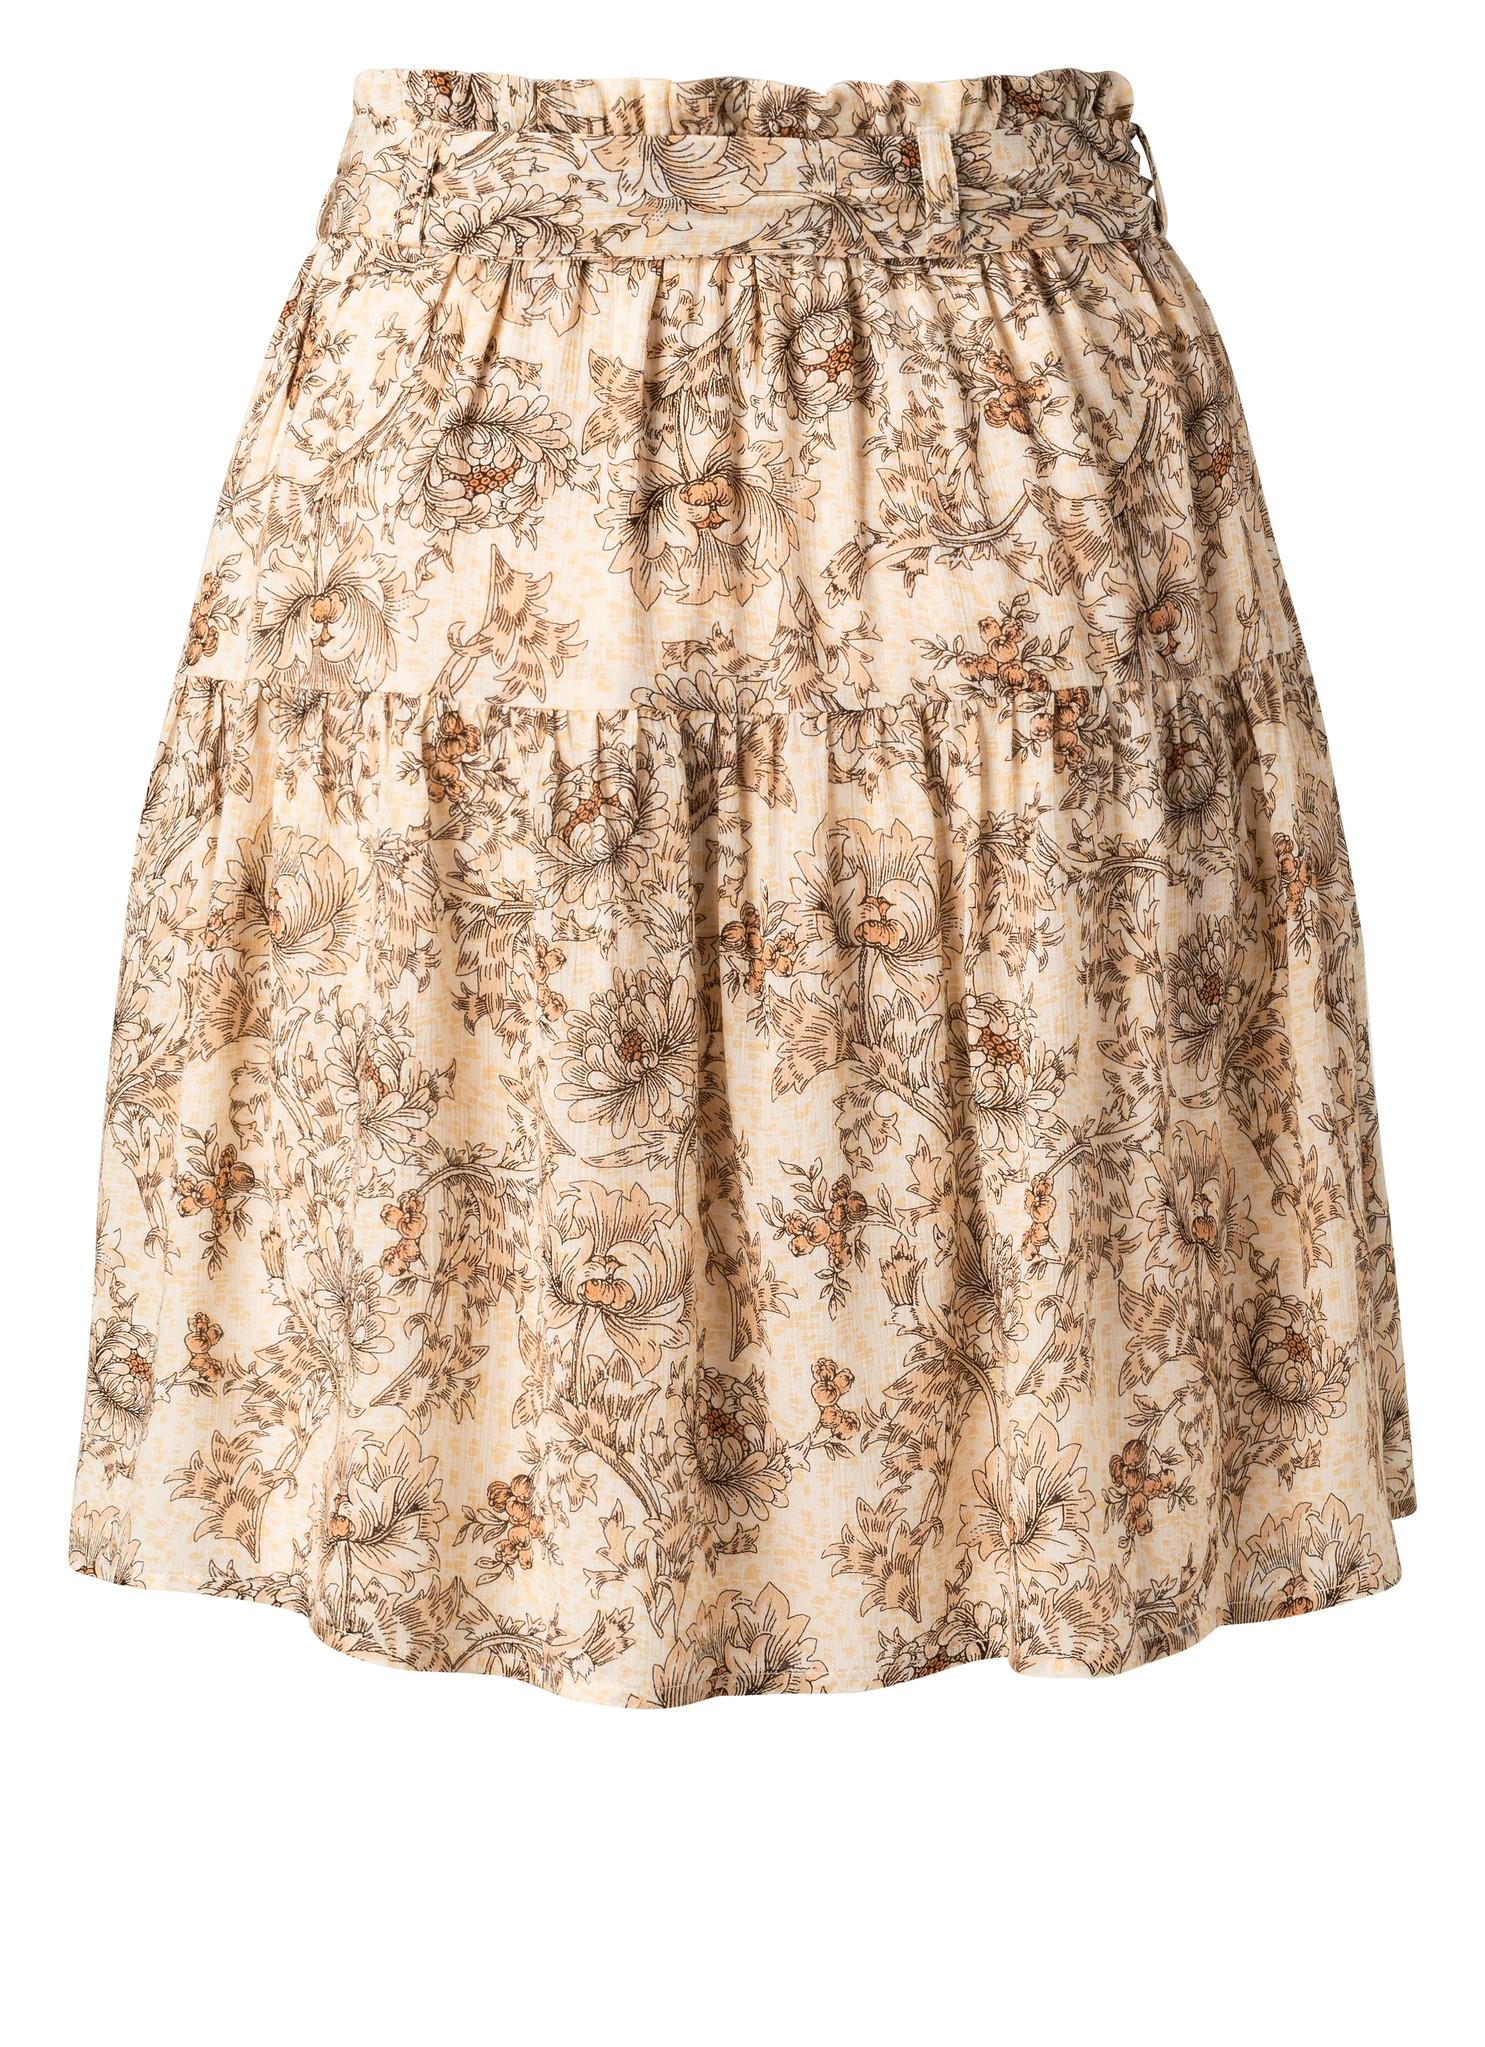 yaya Printed mini skirt 1401140-115-2